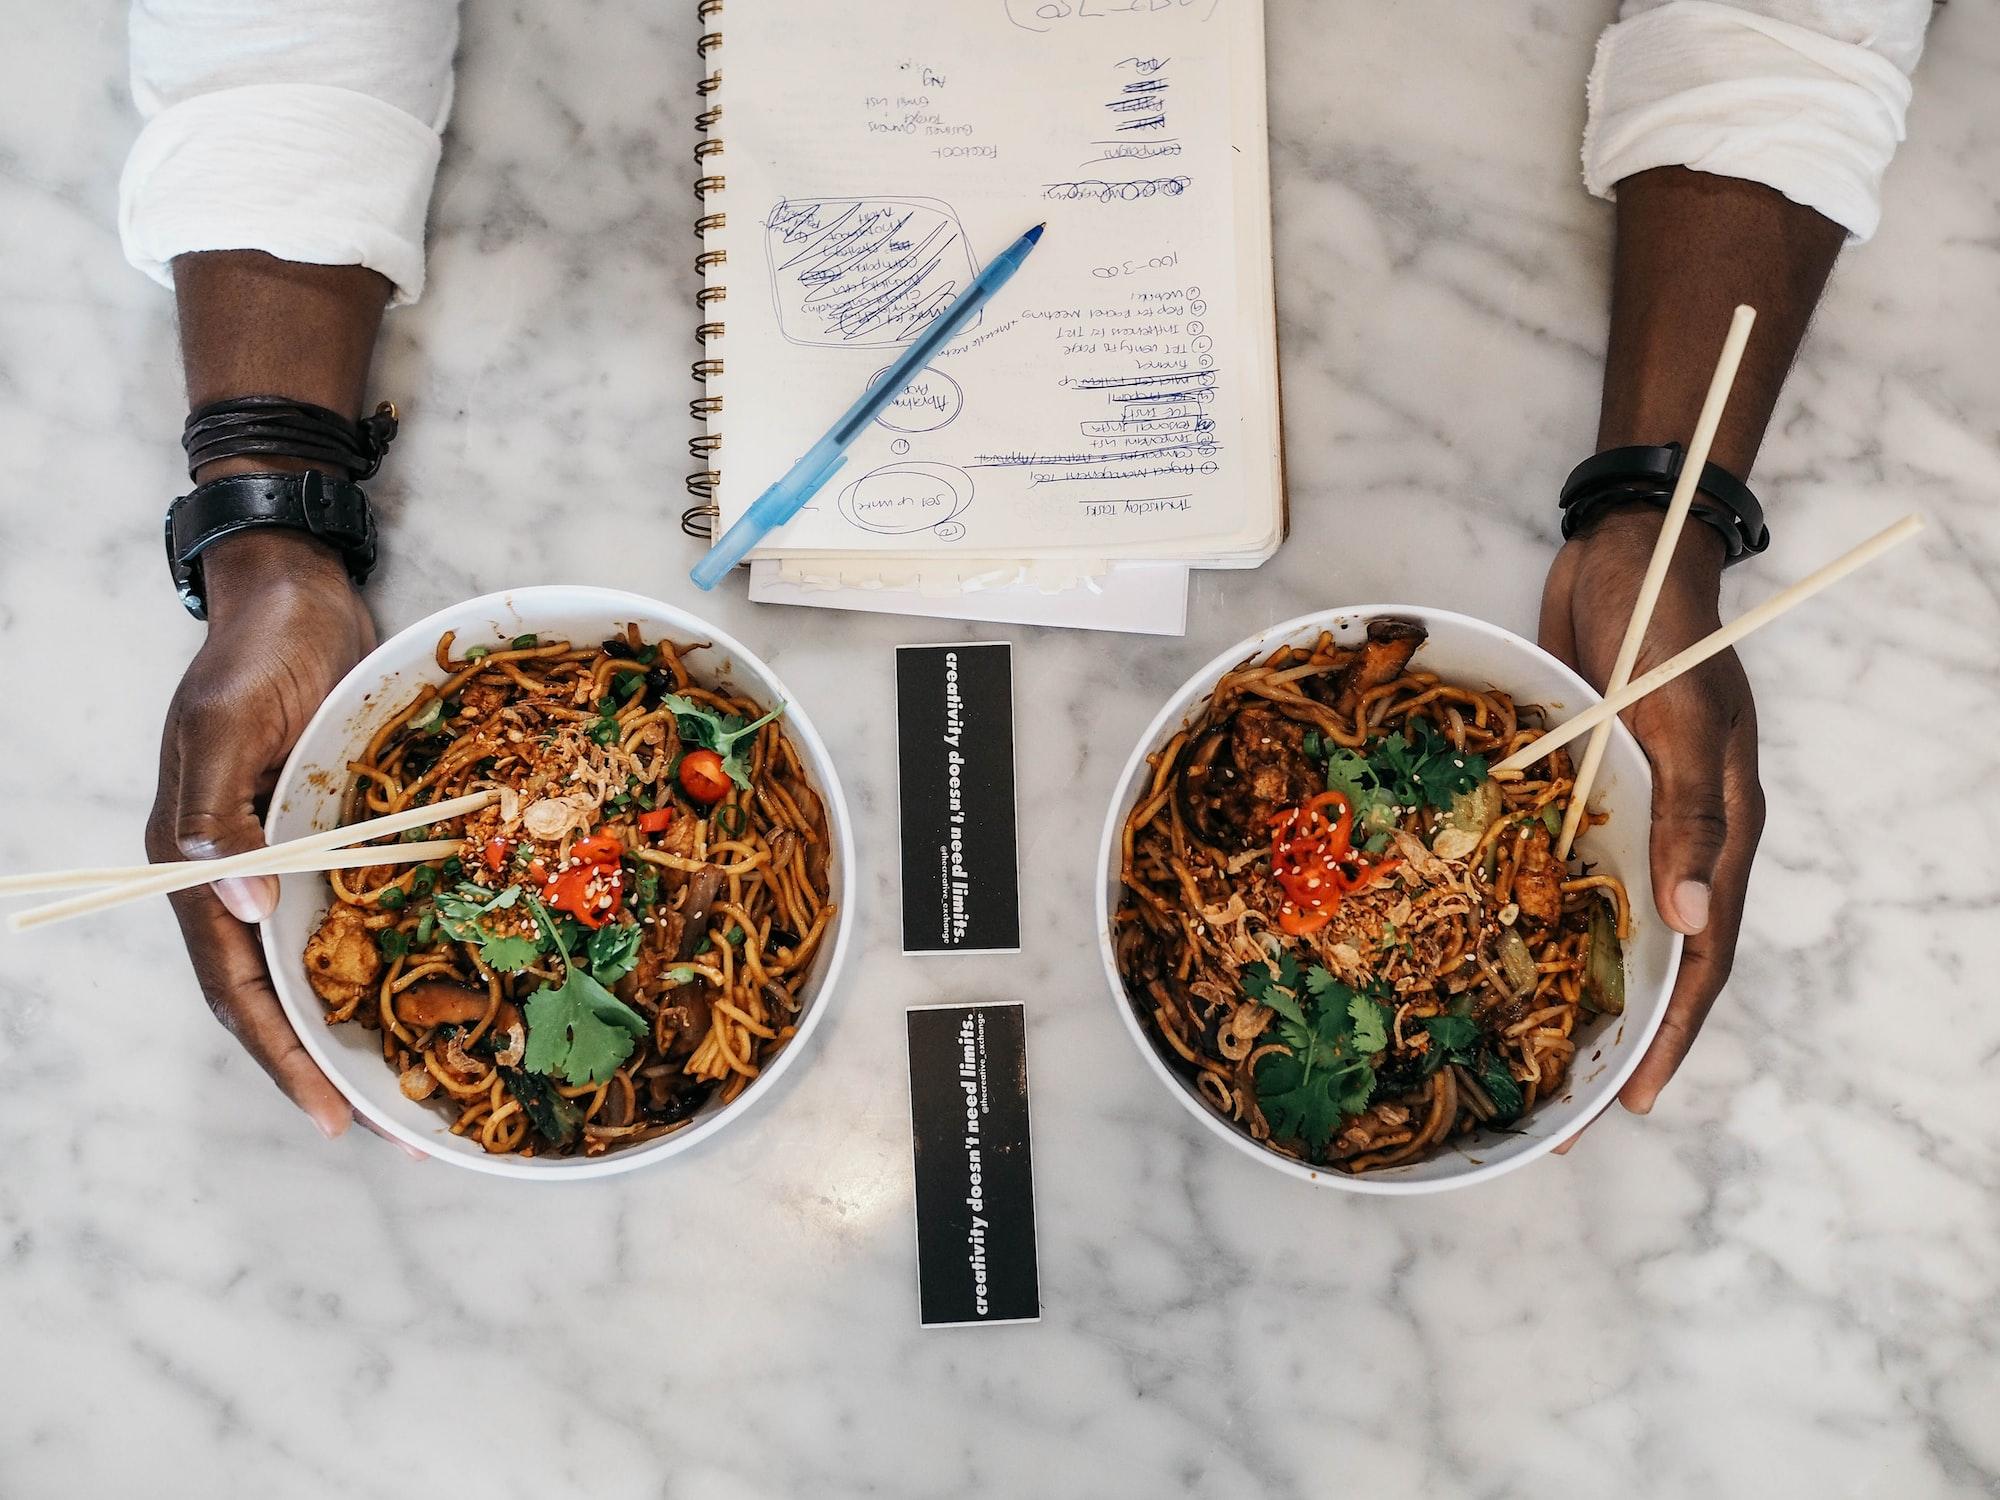 What Restaurants Serve up the Best Thai Food in Denver?